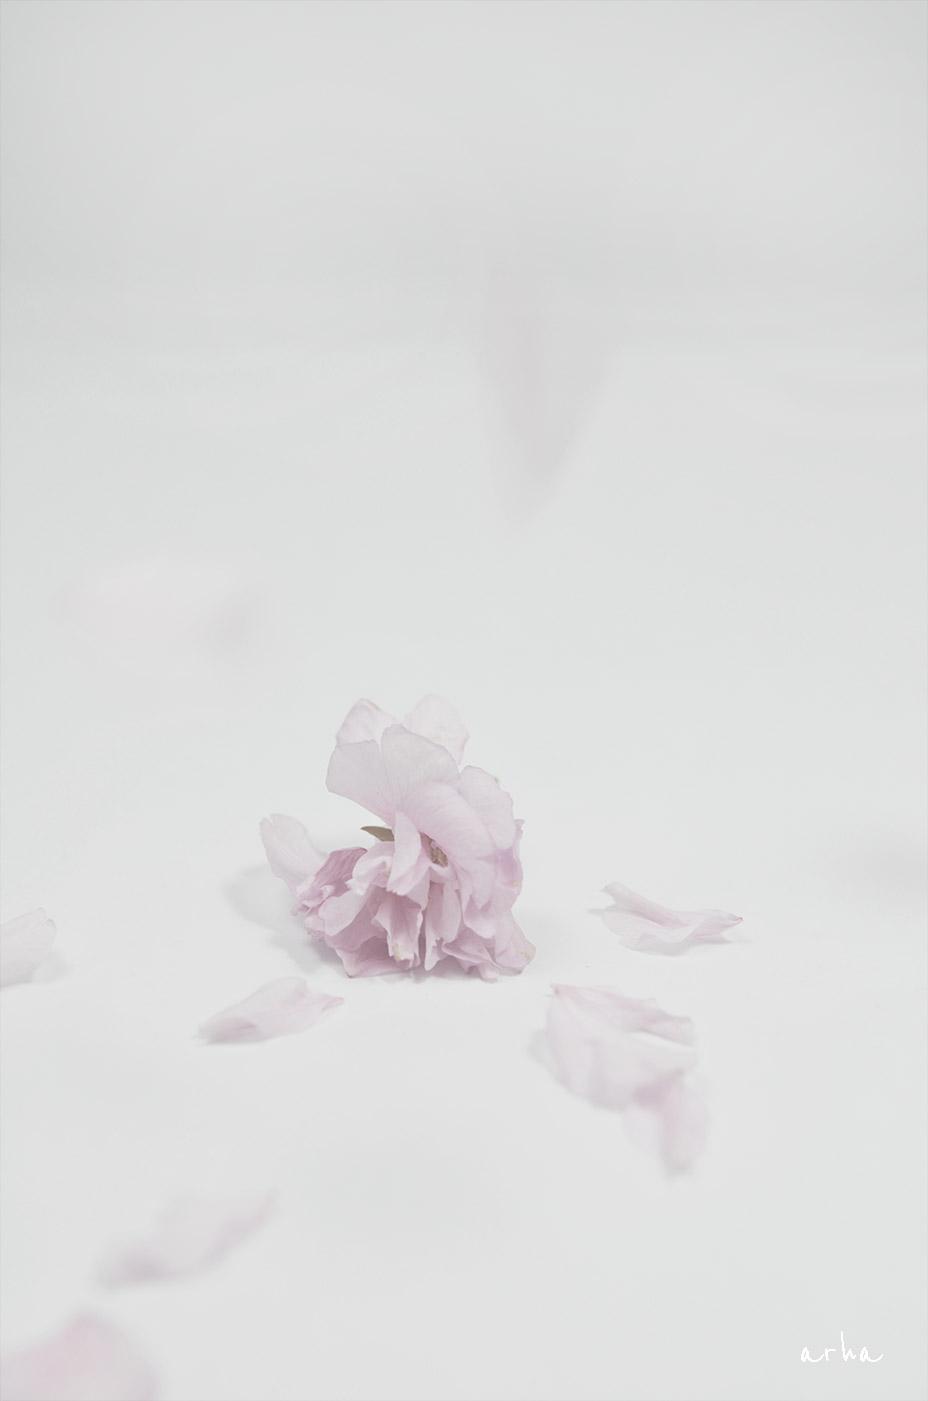 Cherry-blossoms-were-scattered-1-copyright-2012-arha-Tomomichi-Morifuji